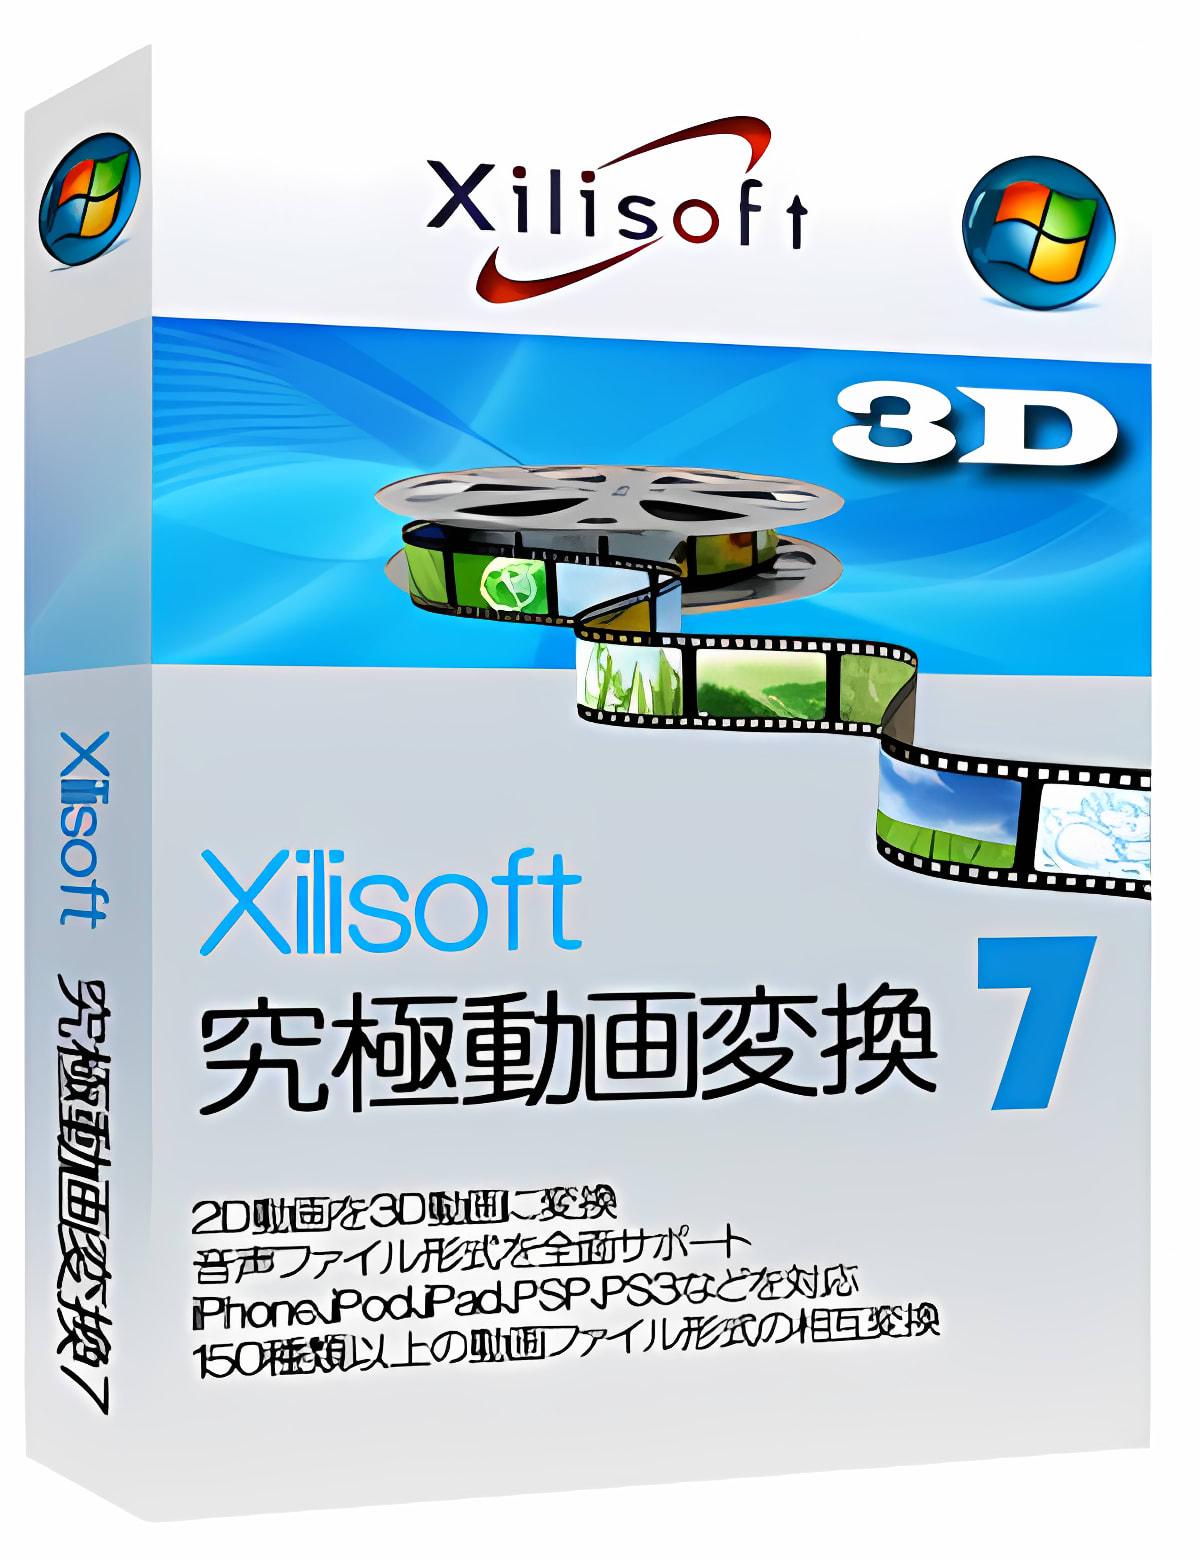 Xilisoft 究極動画変換